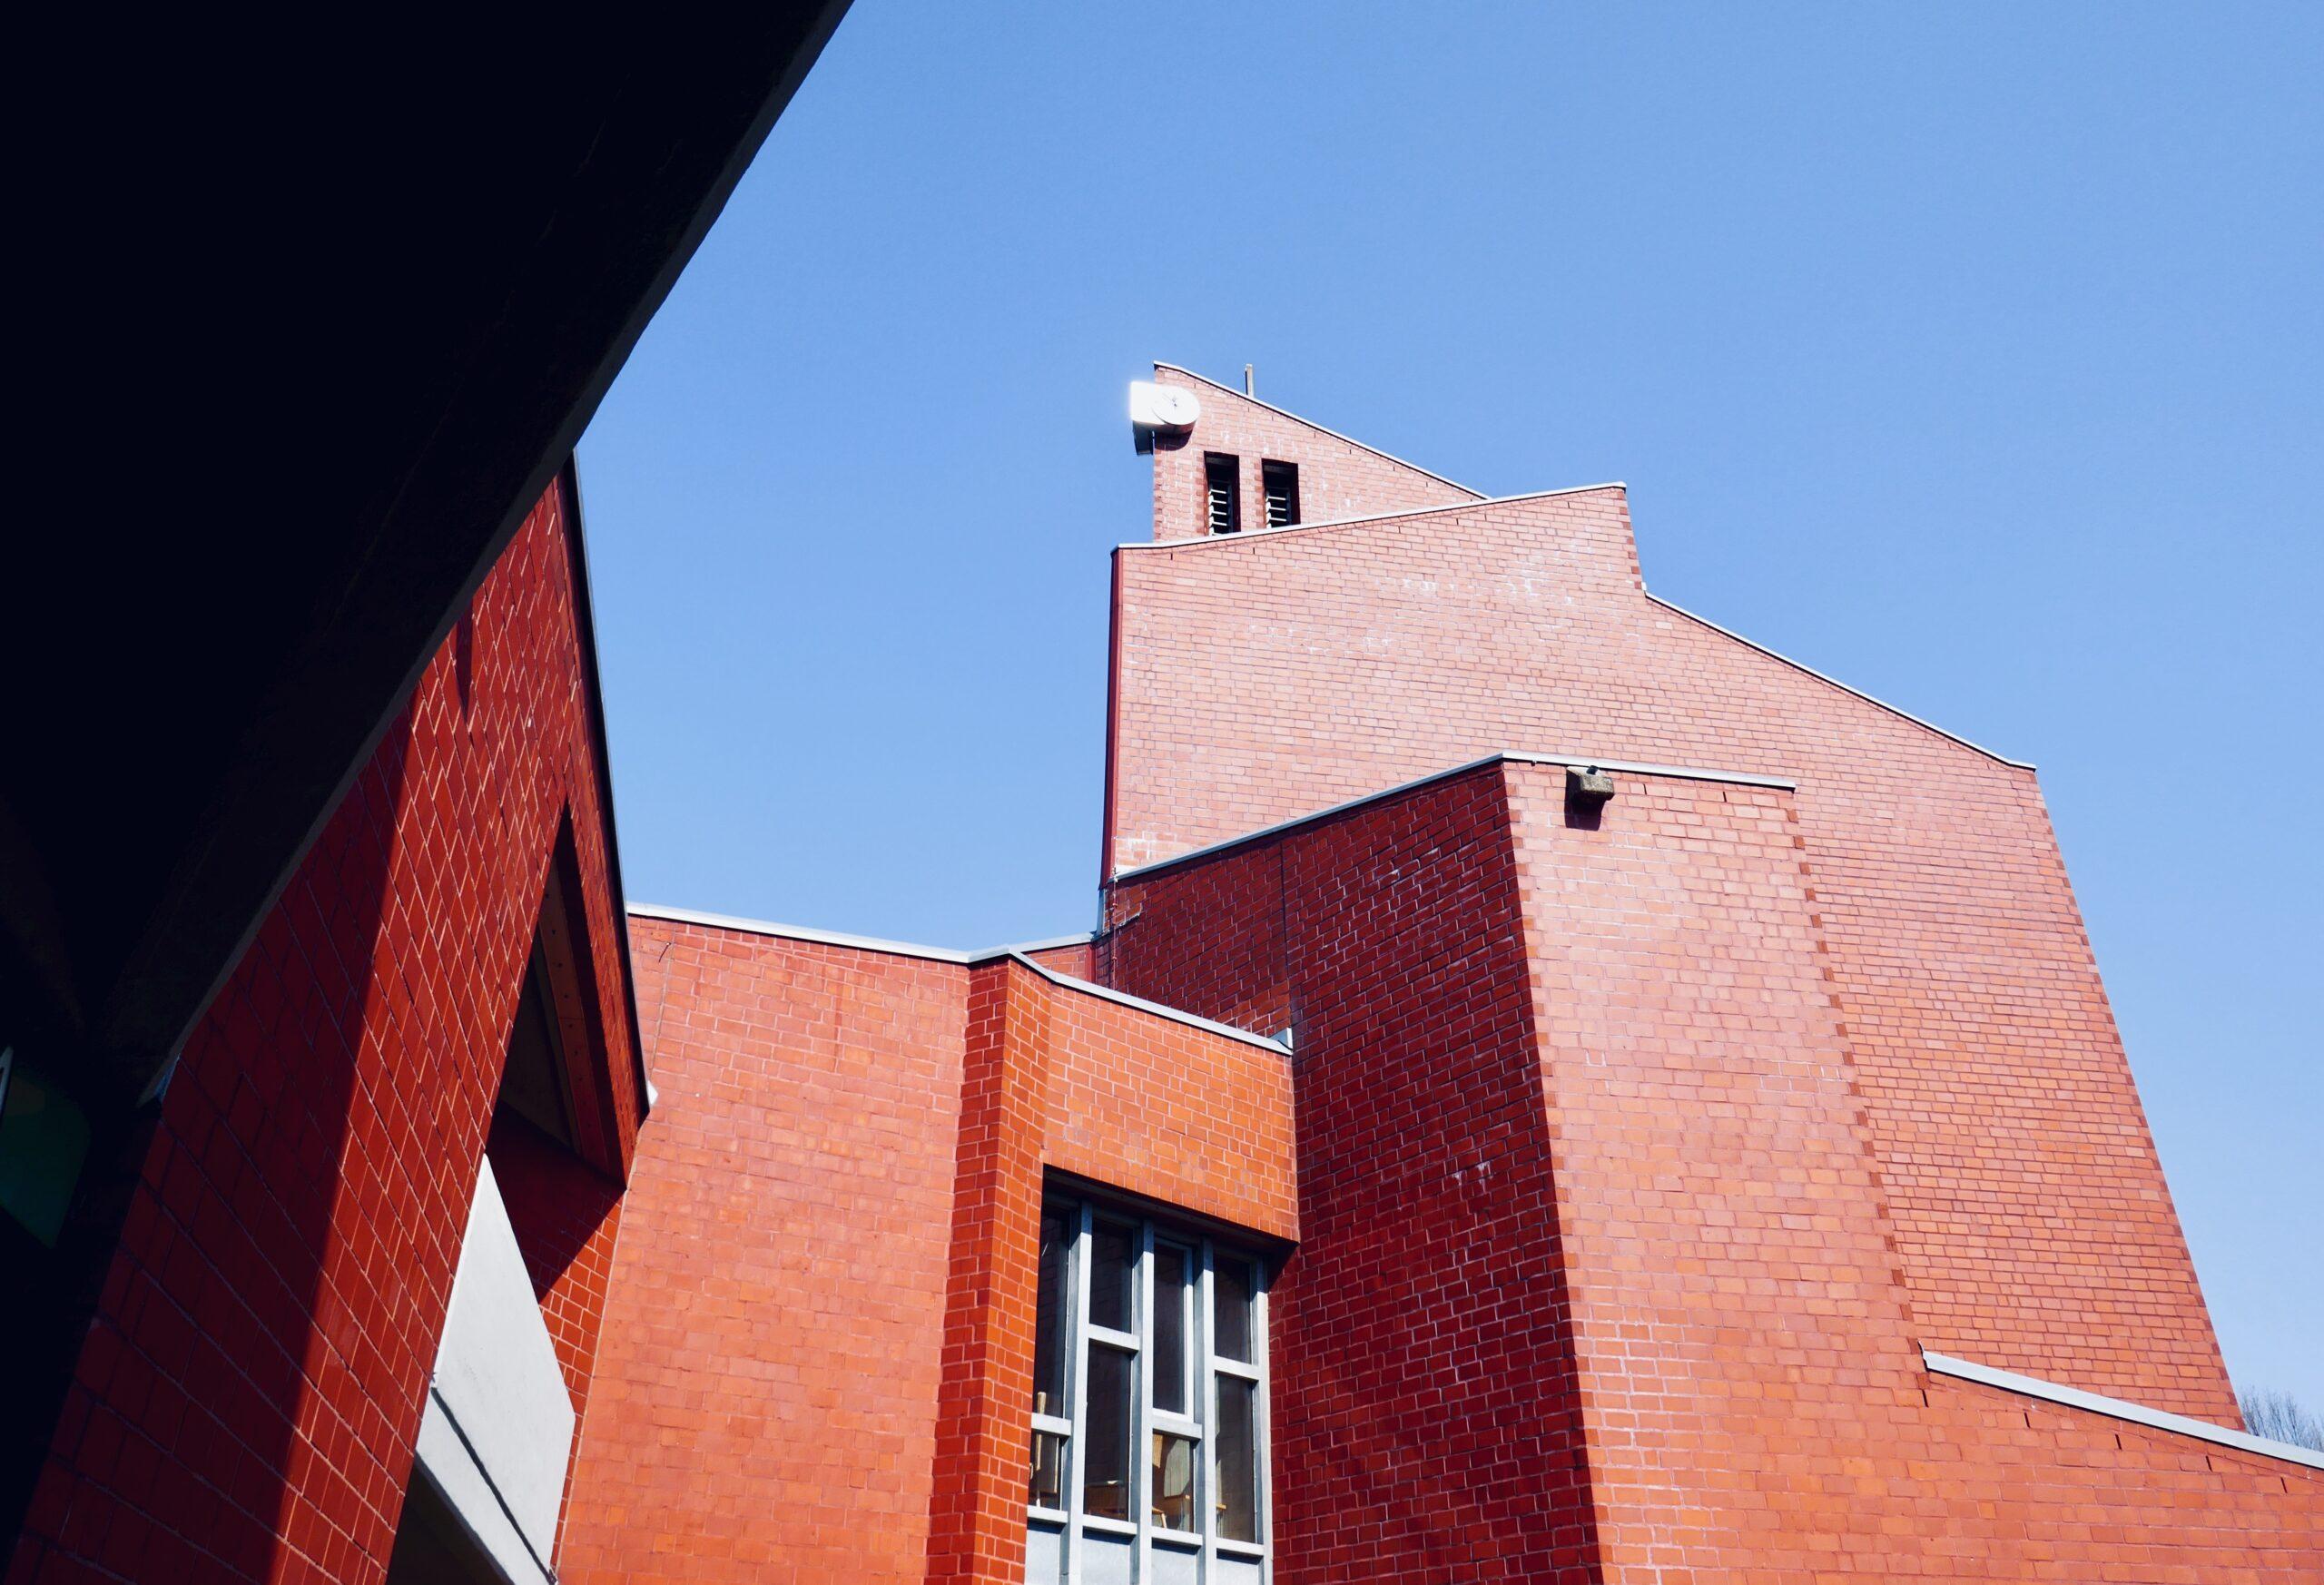 St. Anna-Kirche, Münster (1966-1972, Harald Deilmann) - Foto: Stefan Rethfeld